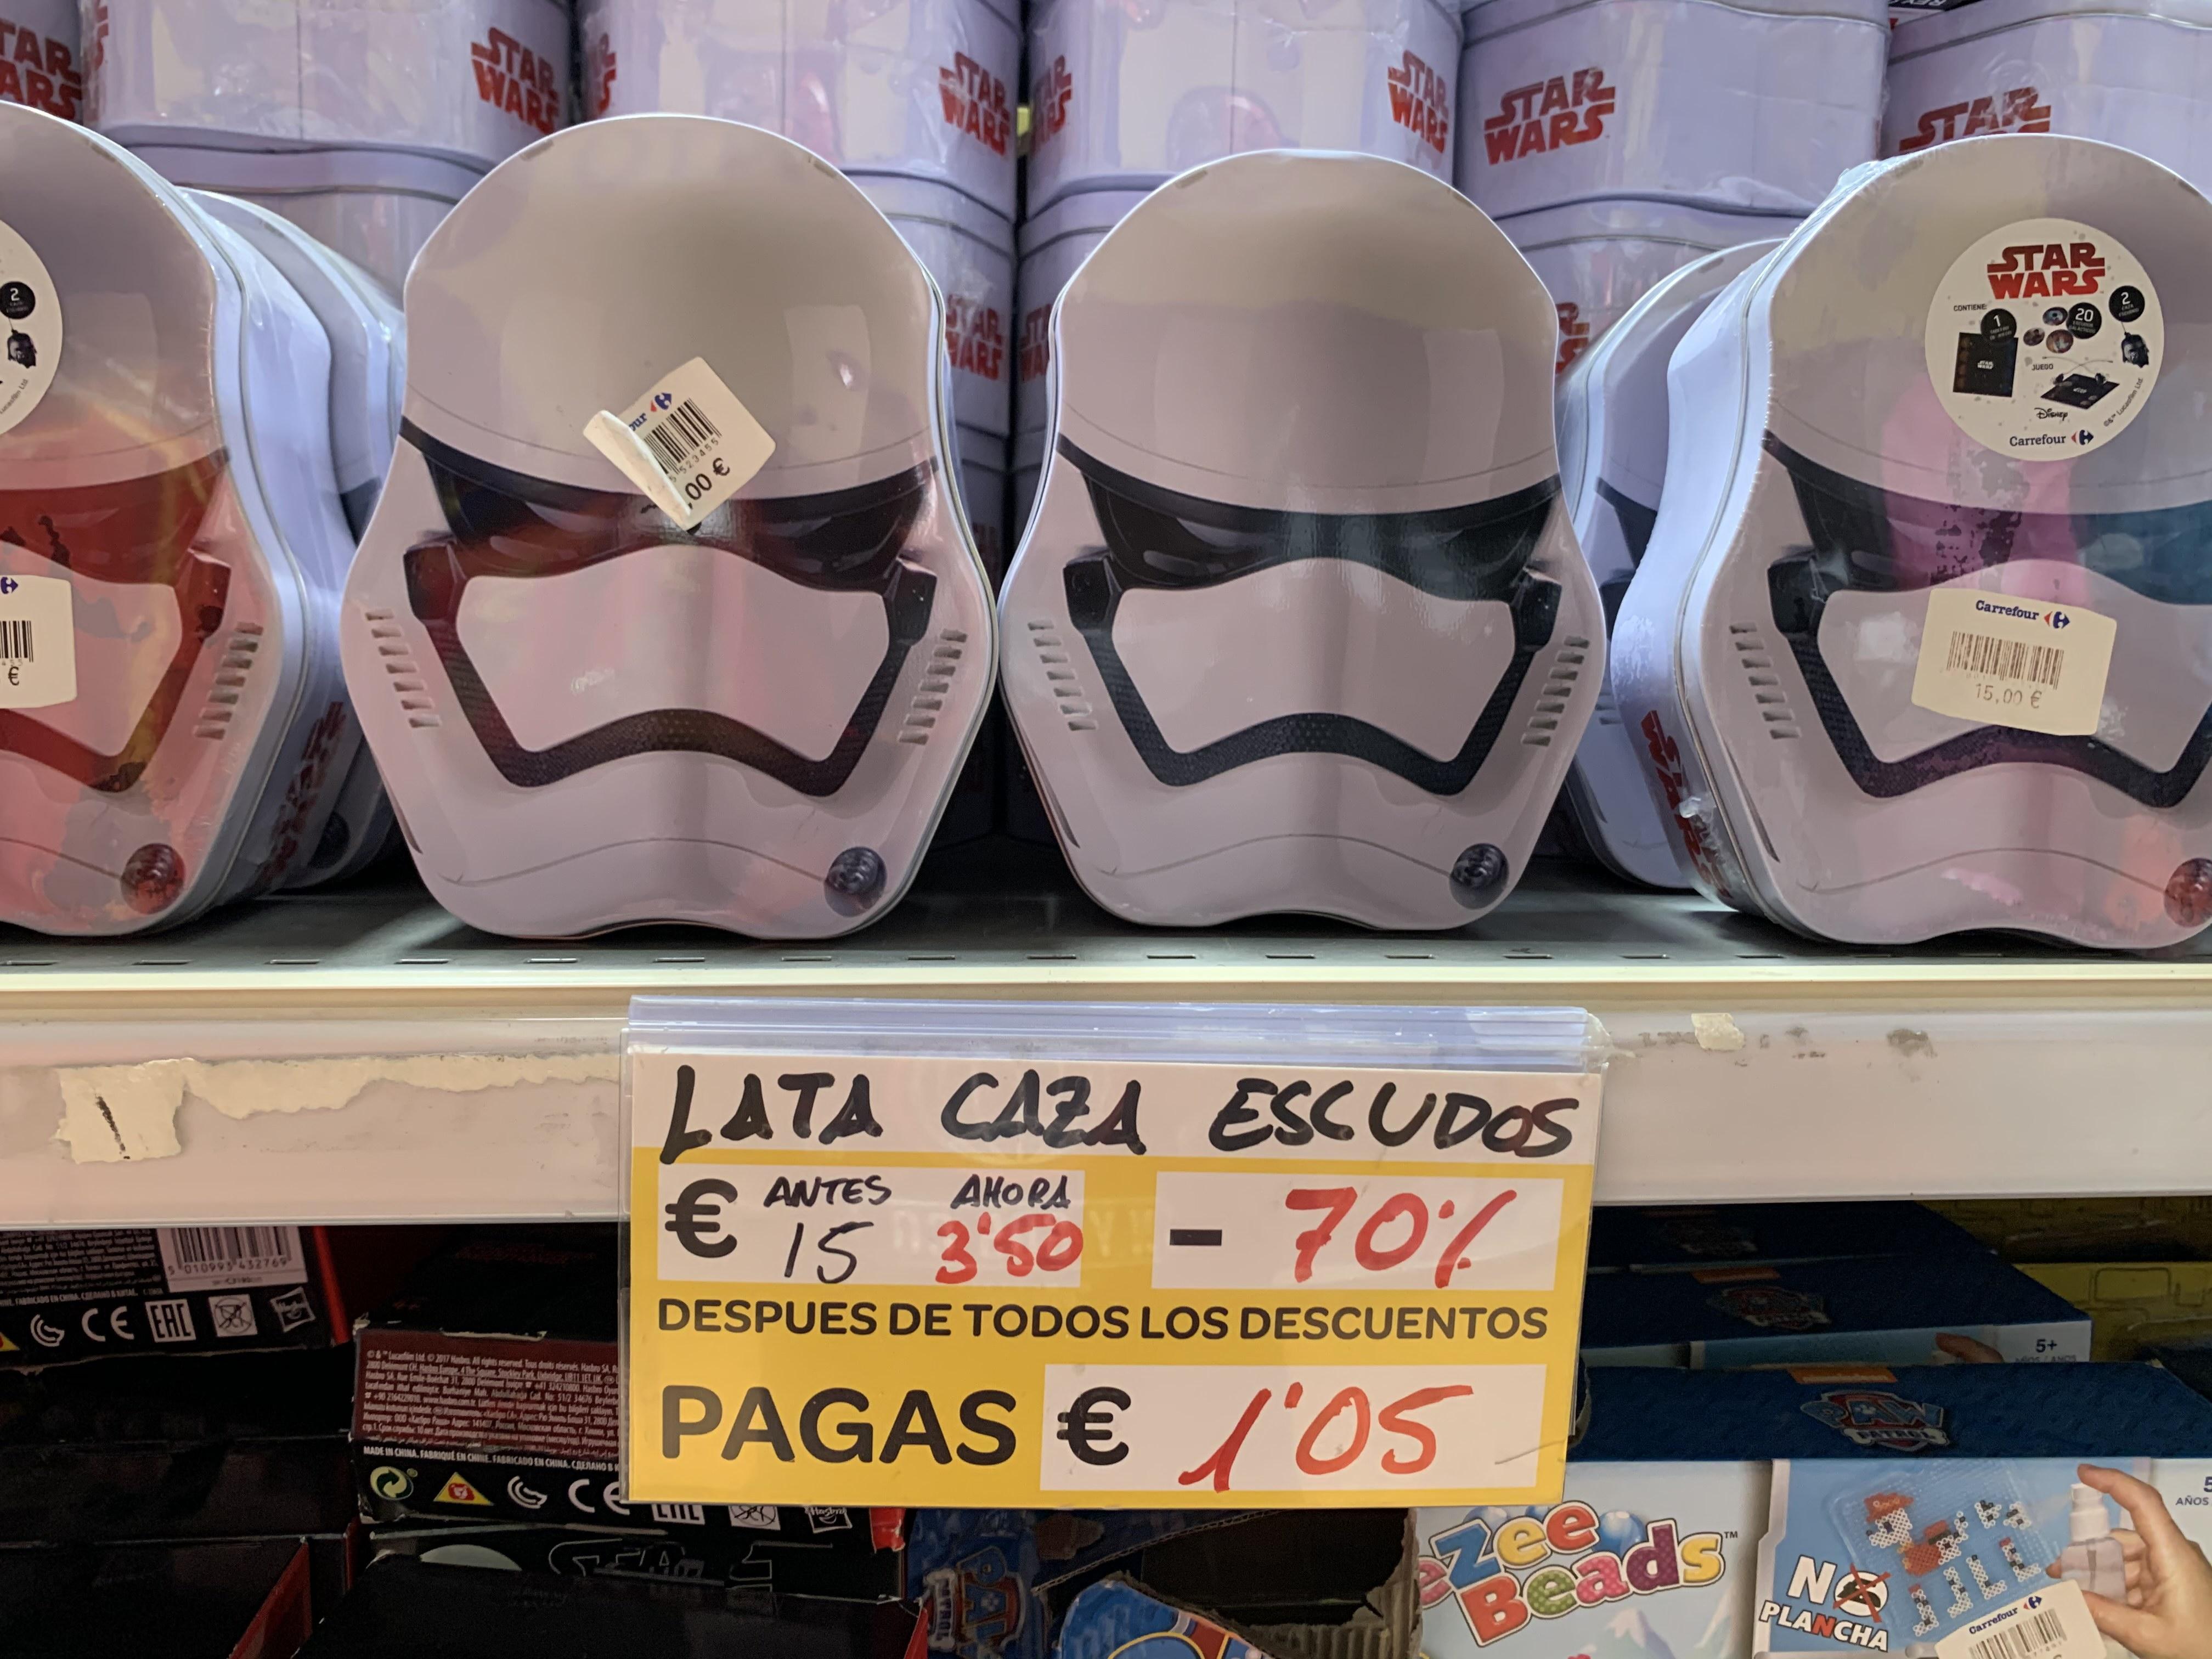 Lata Star Wars + 20 Escudos (Carrefour Murcia, Atalayas)